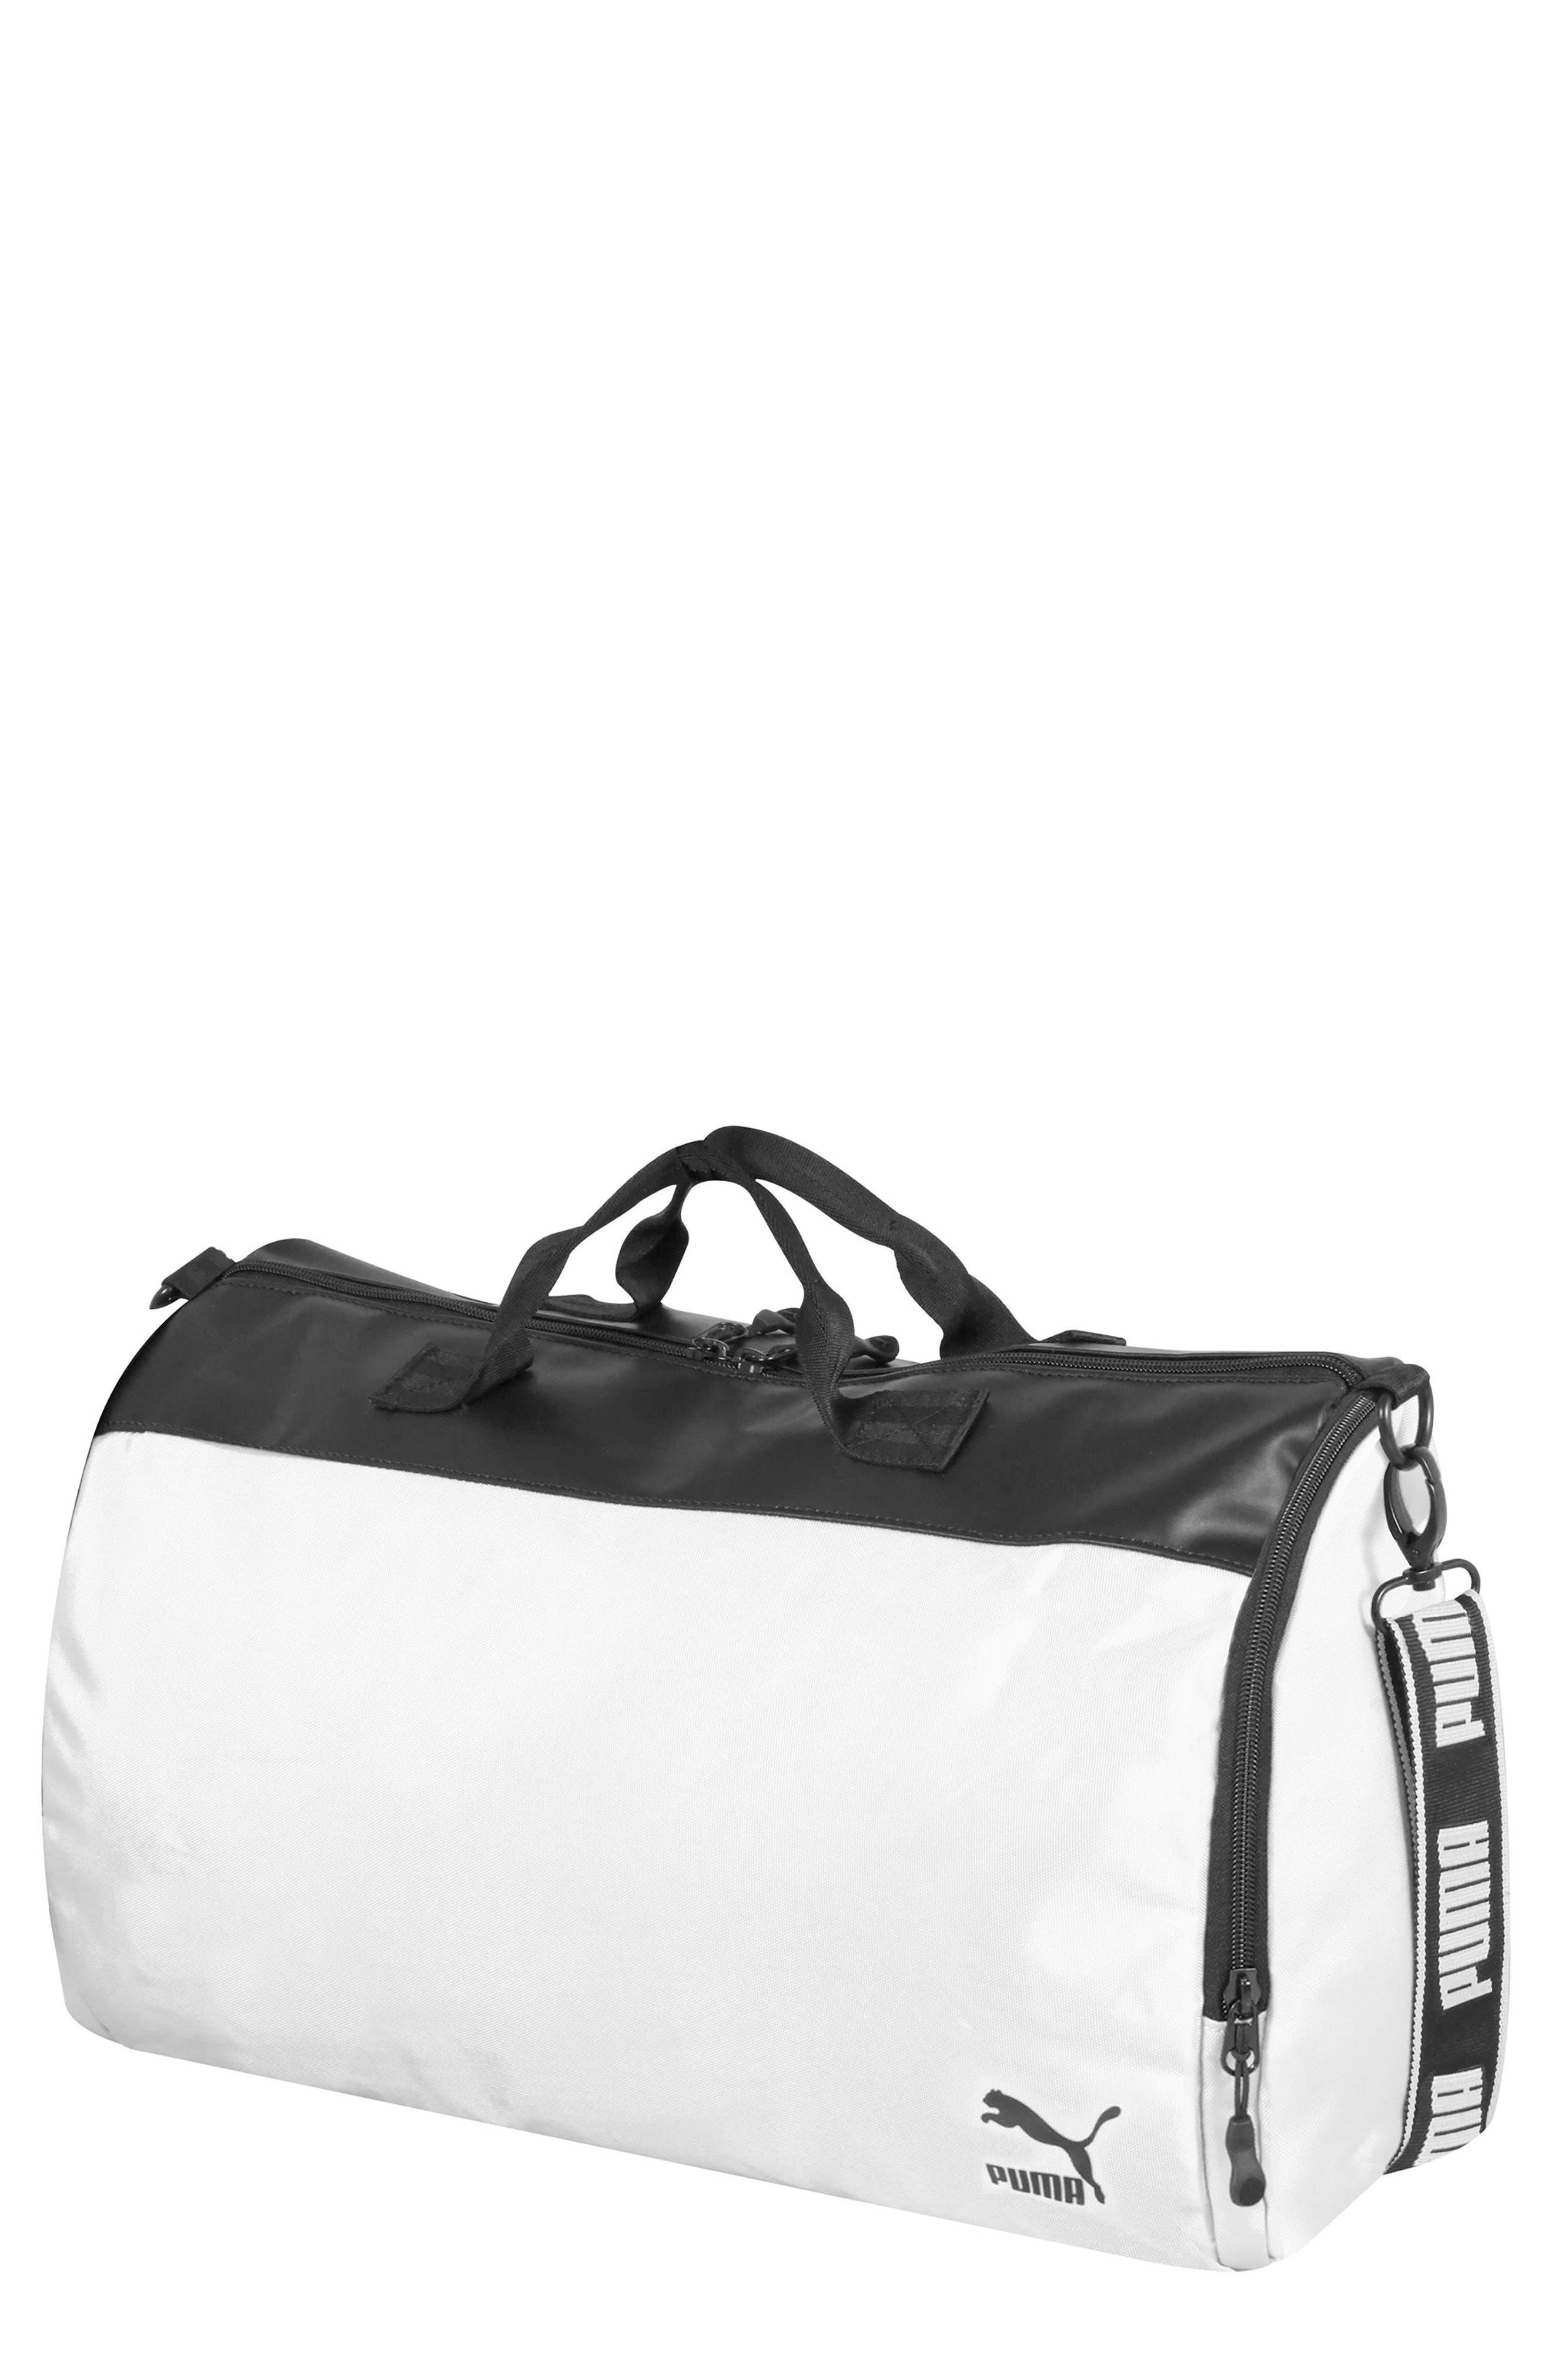 Archive Duffel Bag,                             Main thumbnail 1, color,                             BLACK/ WHITE